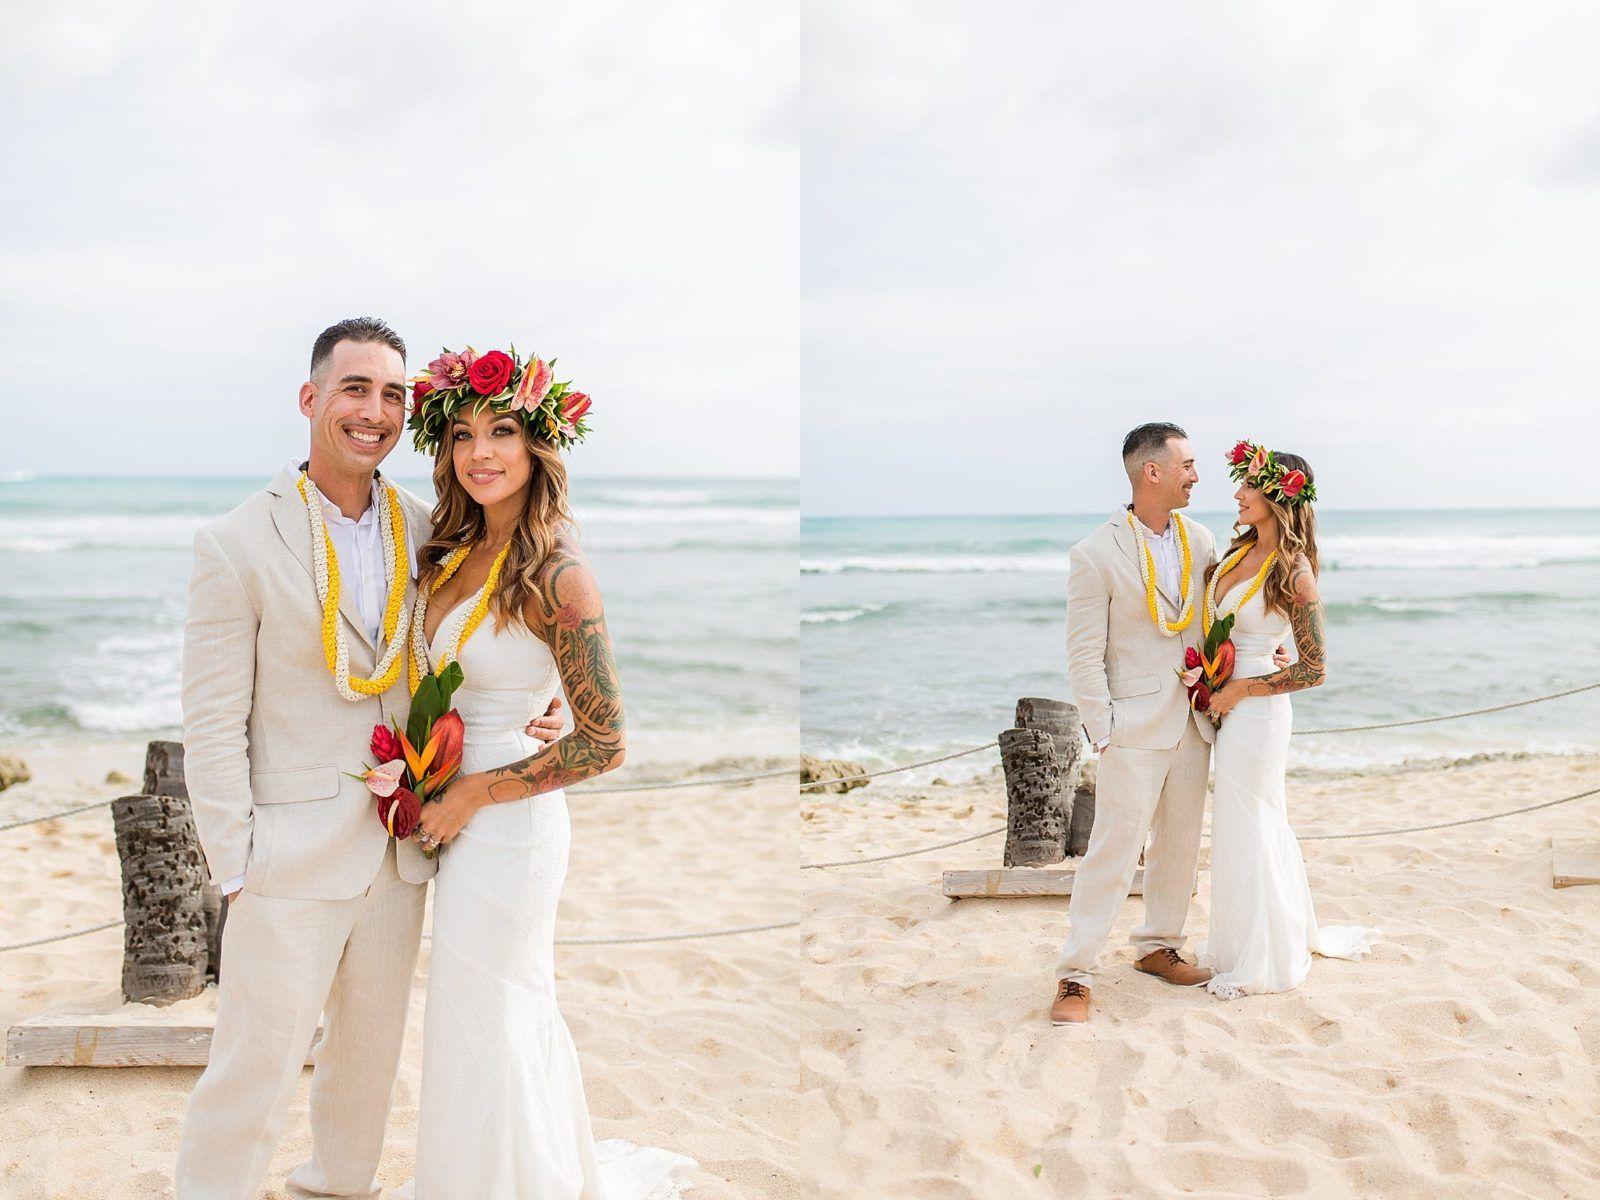 Hawaii Wedding Photographer Jeanine And Hershel Germaine S Luau Wedding Luau Wedding Hawaiian Wedding Wedding